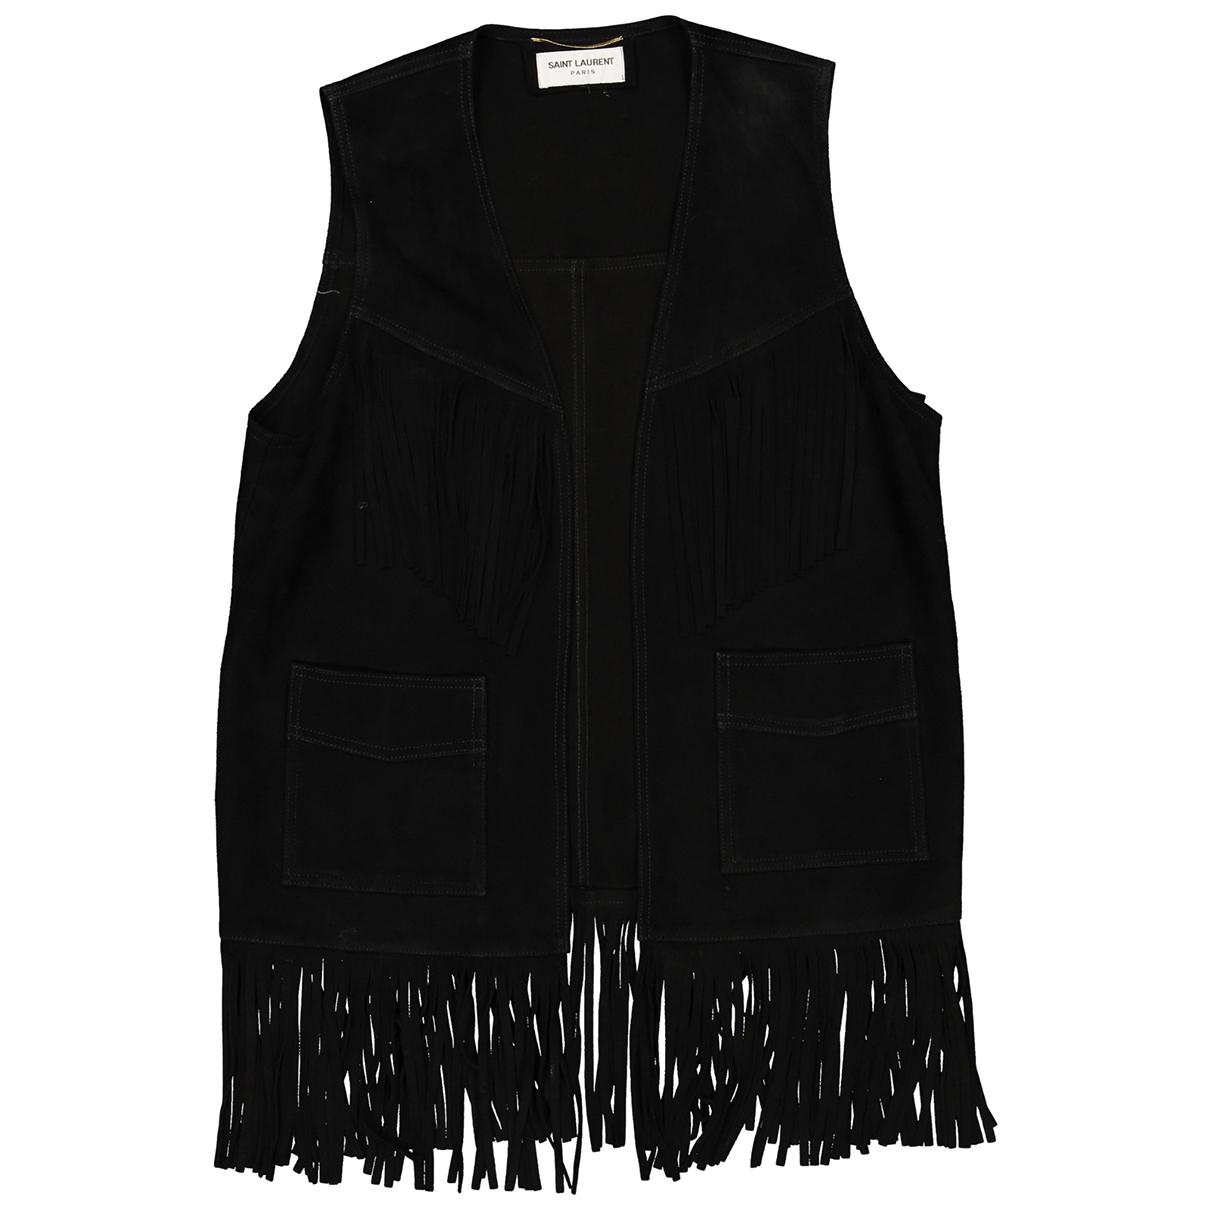 Saint Laurent \N Black Suede jacket for Women 38 FR